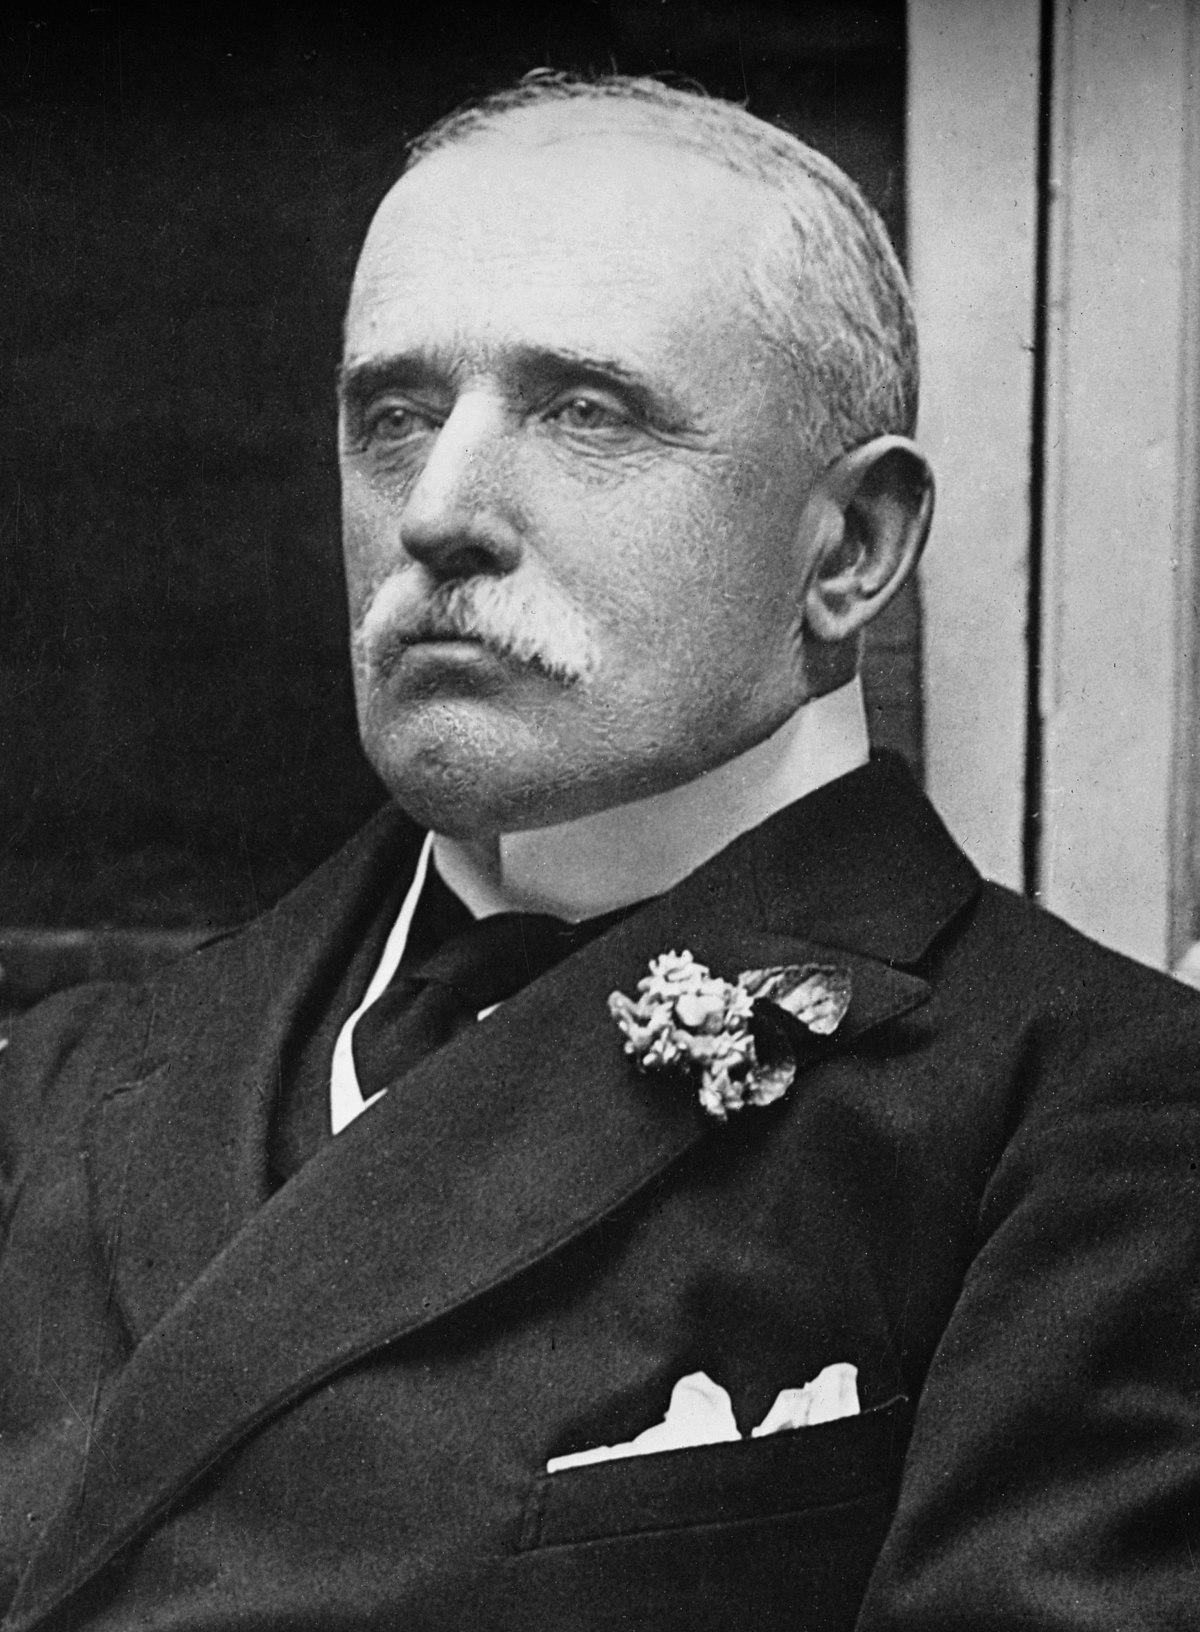 brigadier john deverell biography of william